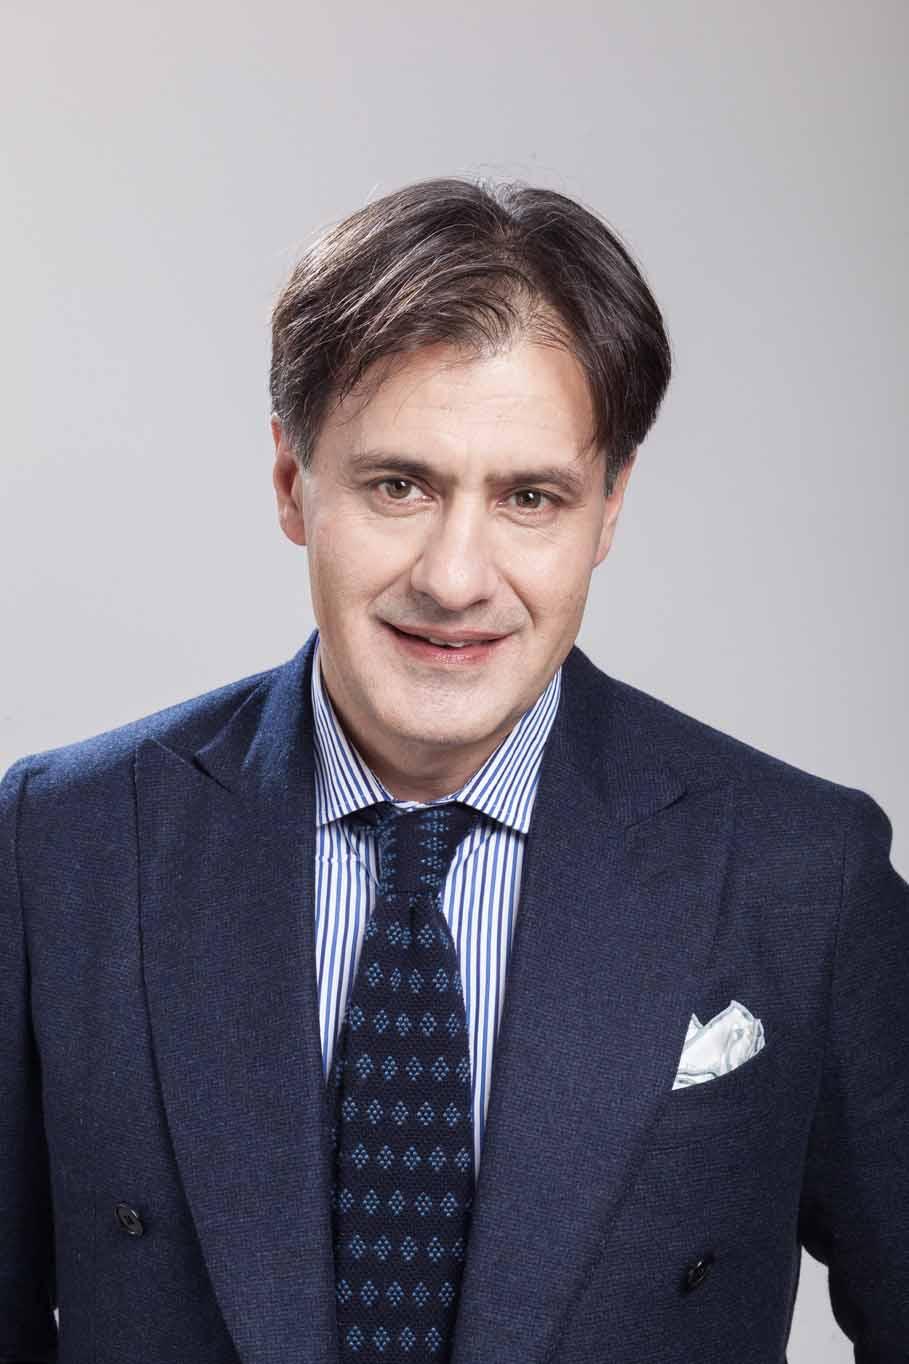 Nicola Mastromartino, presidente del Gruppo VéGé